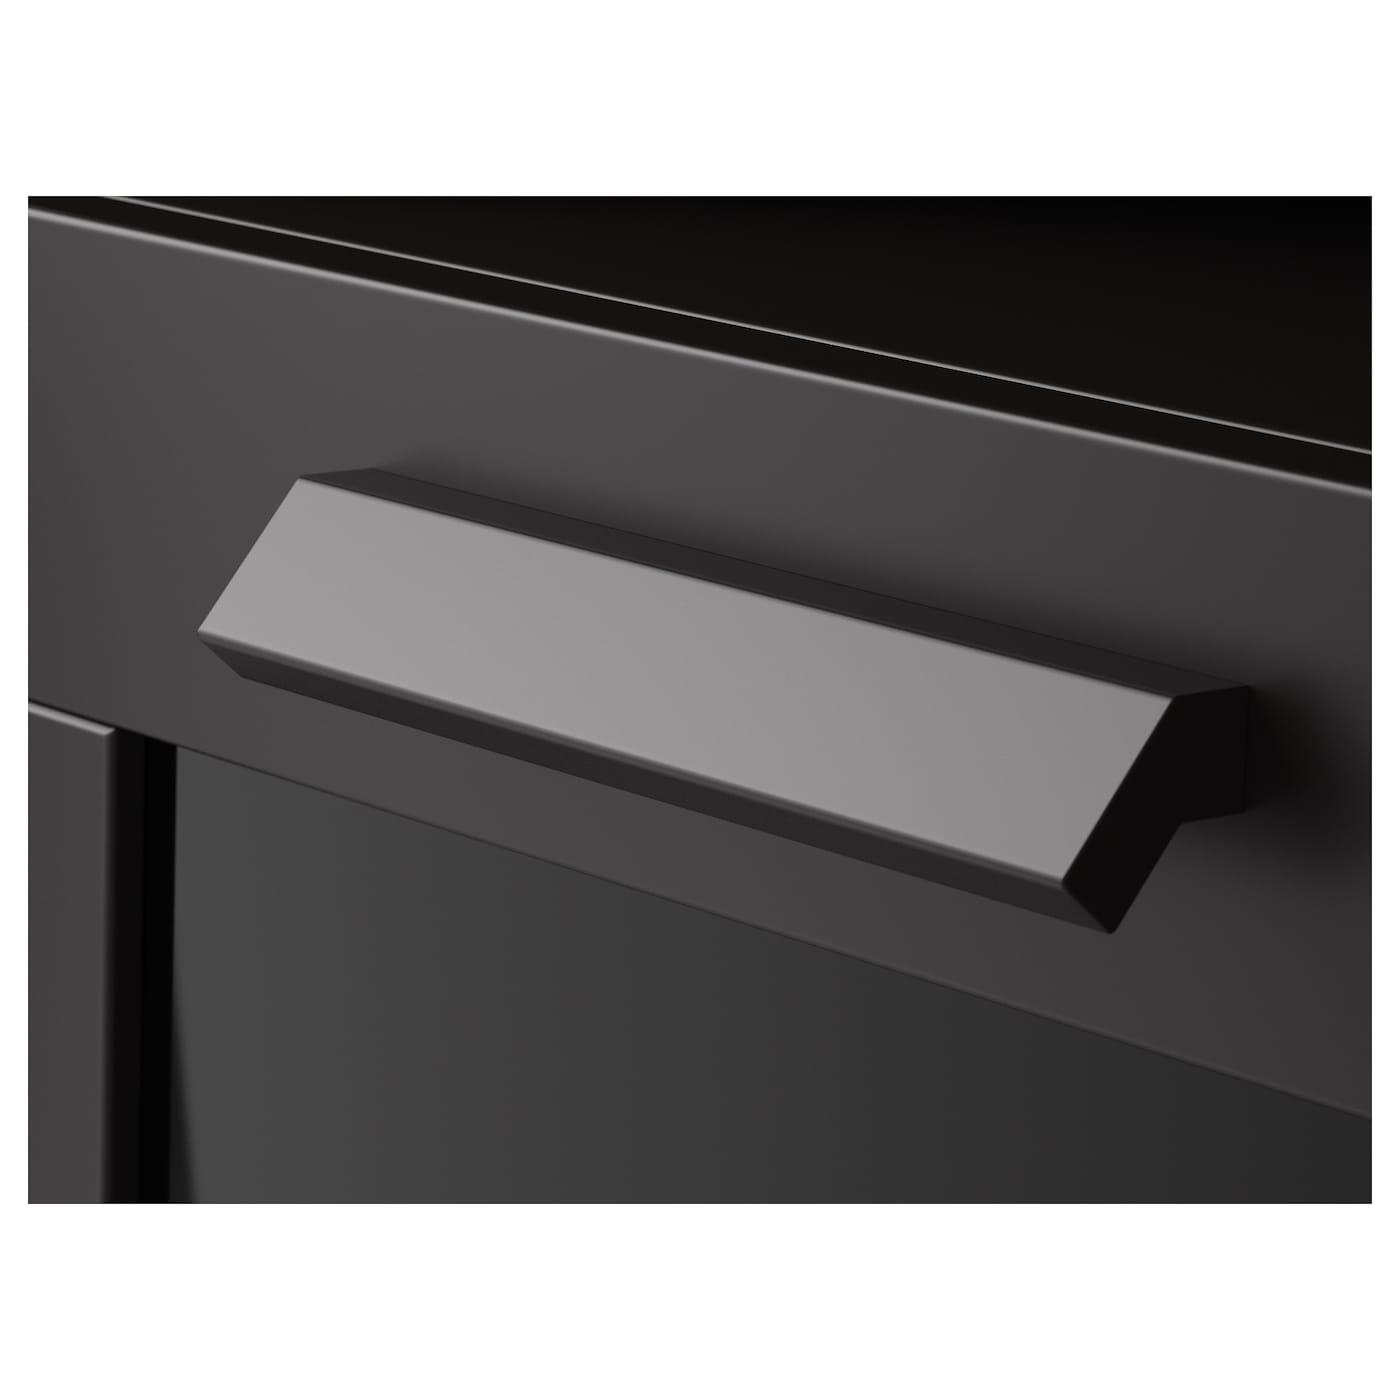 brimnes commode 2 tiroirs noir 50x77 cm ikea. Black Bedroom Furniture Sets. Home Design Ideas